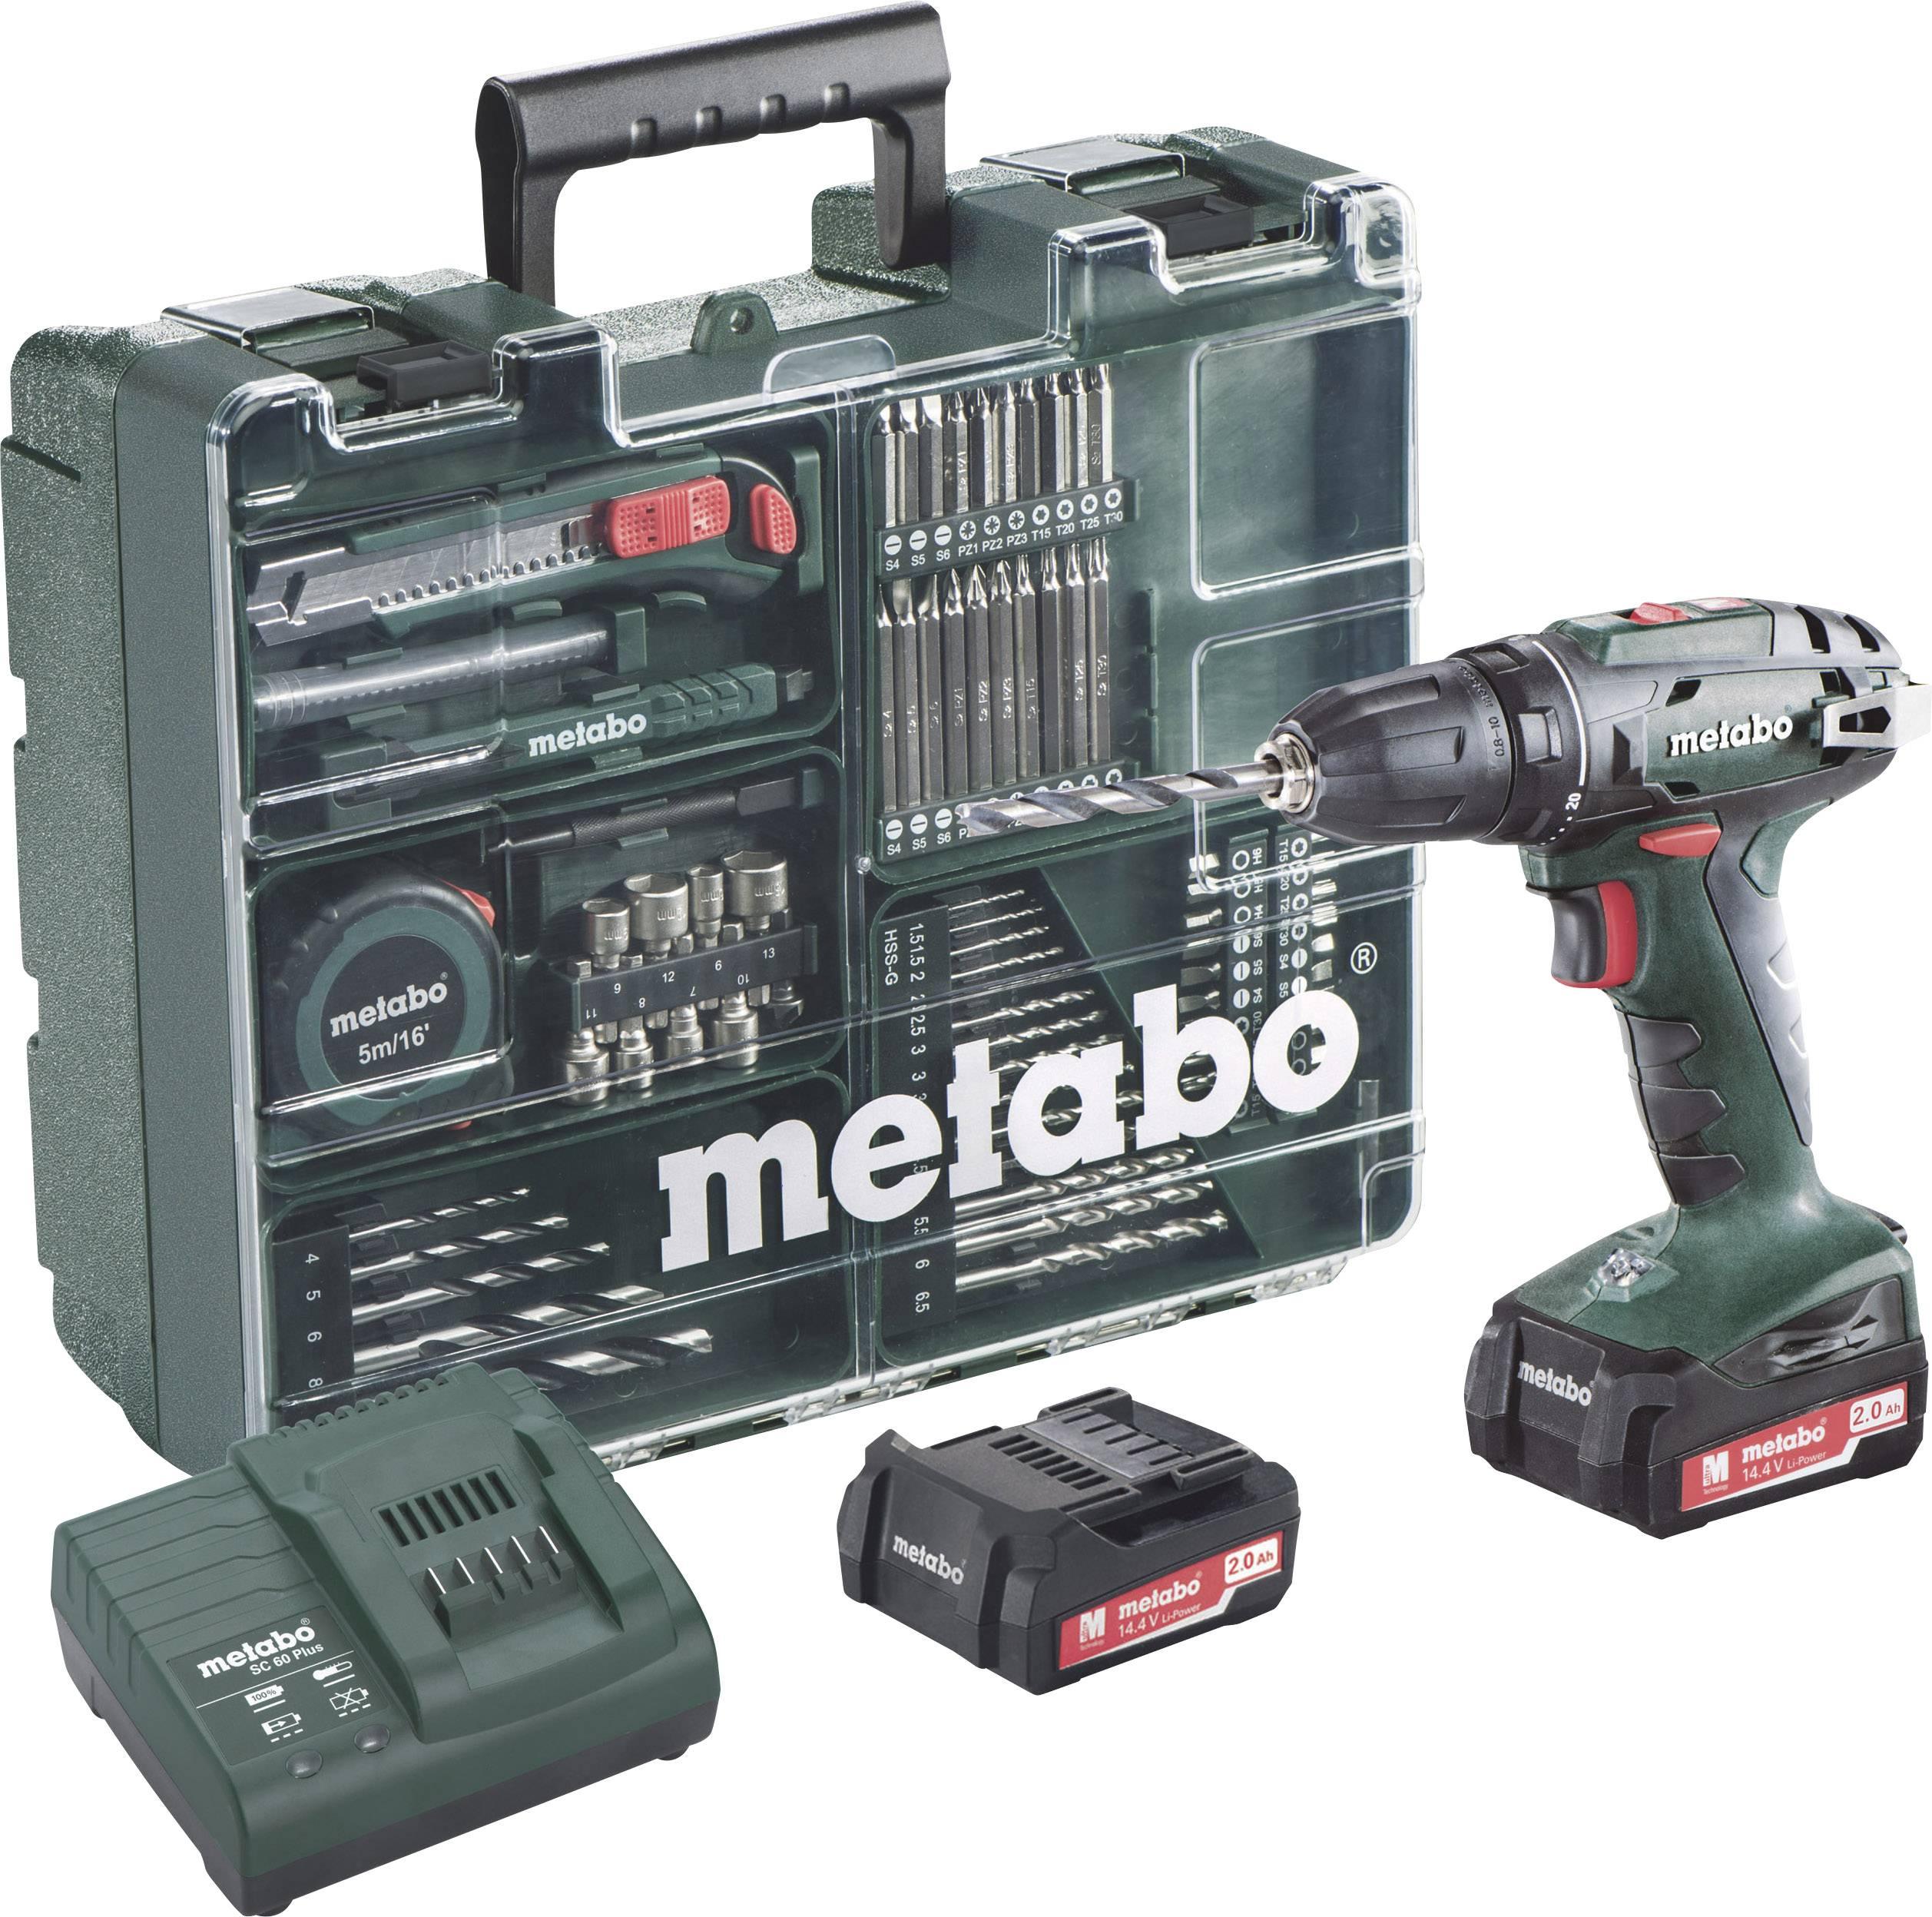 Aku vrtací šroubovák Metabo BS 14.4 602206880, 14.4 V, 2 Ah, Li-Ion akumulátor